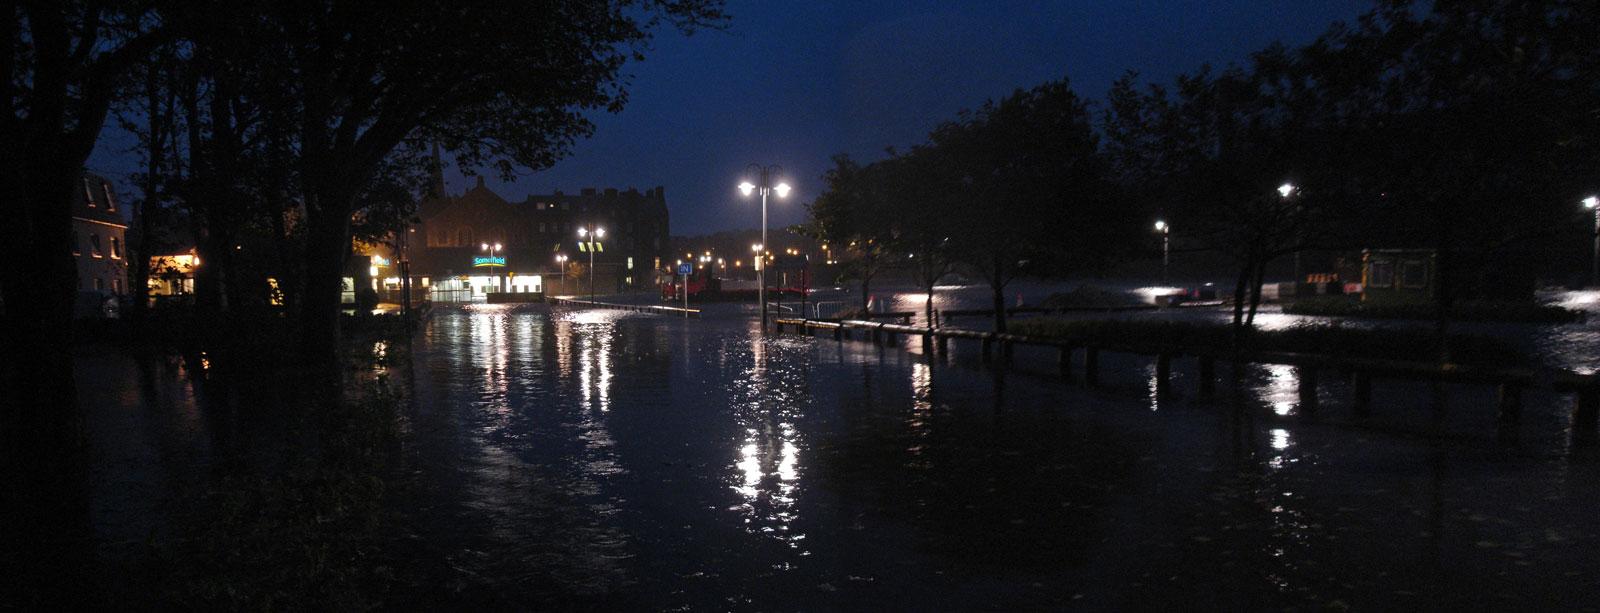 Photo: Somerfield, Wick Under Water